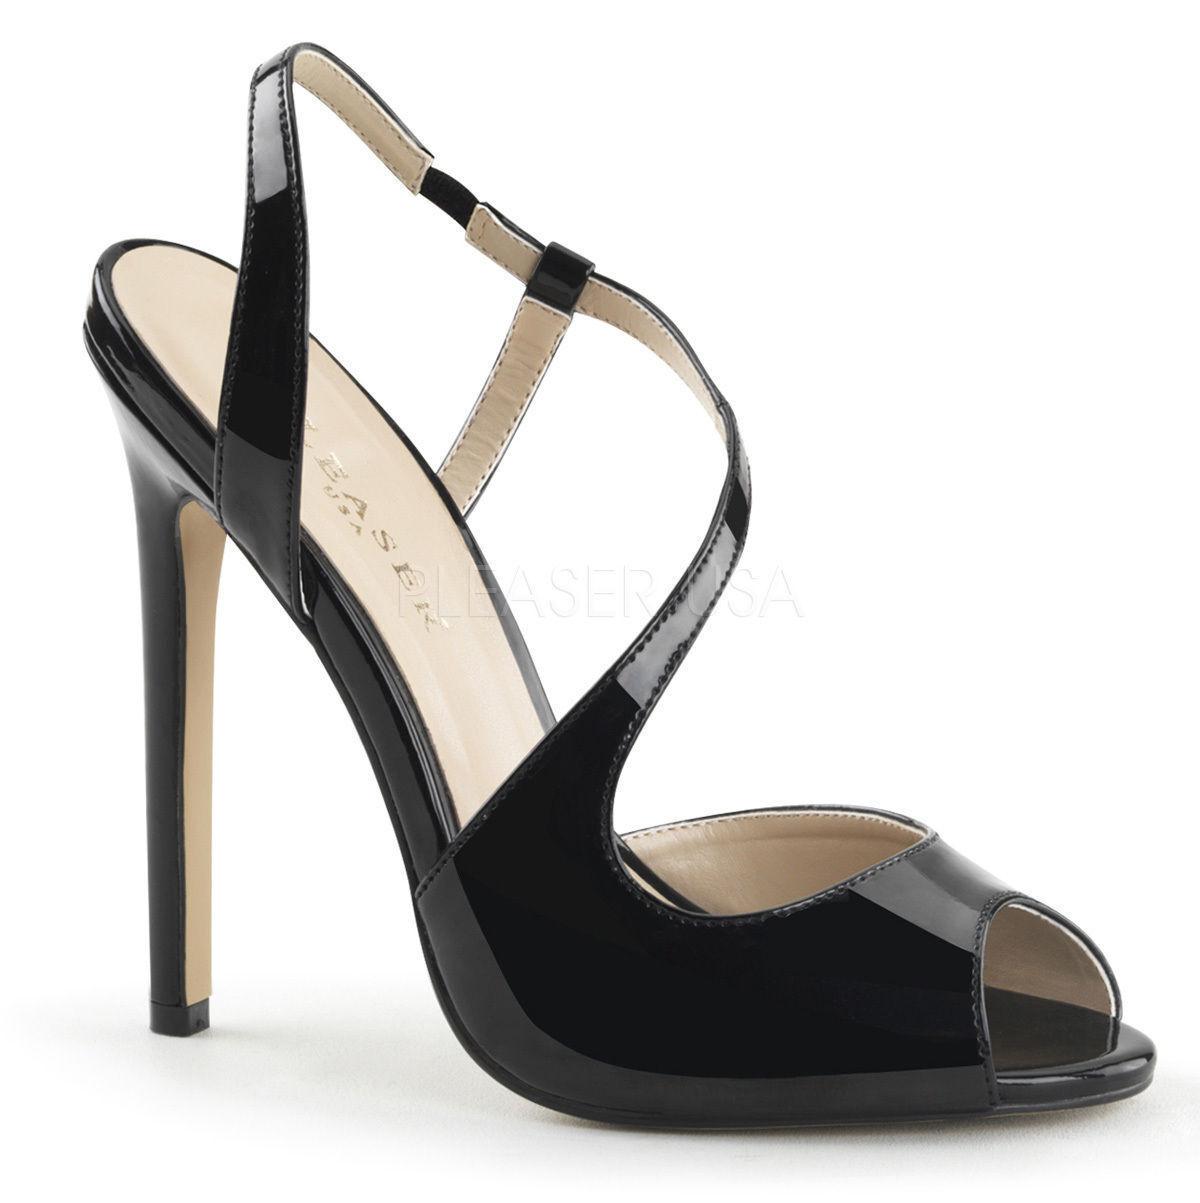 Descuento barato Sexy-10 elegante Pleaser Damen High Heels Slingsandaletten schwarz Lack Gr 40